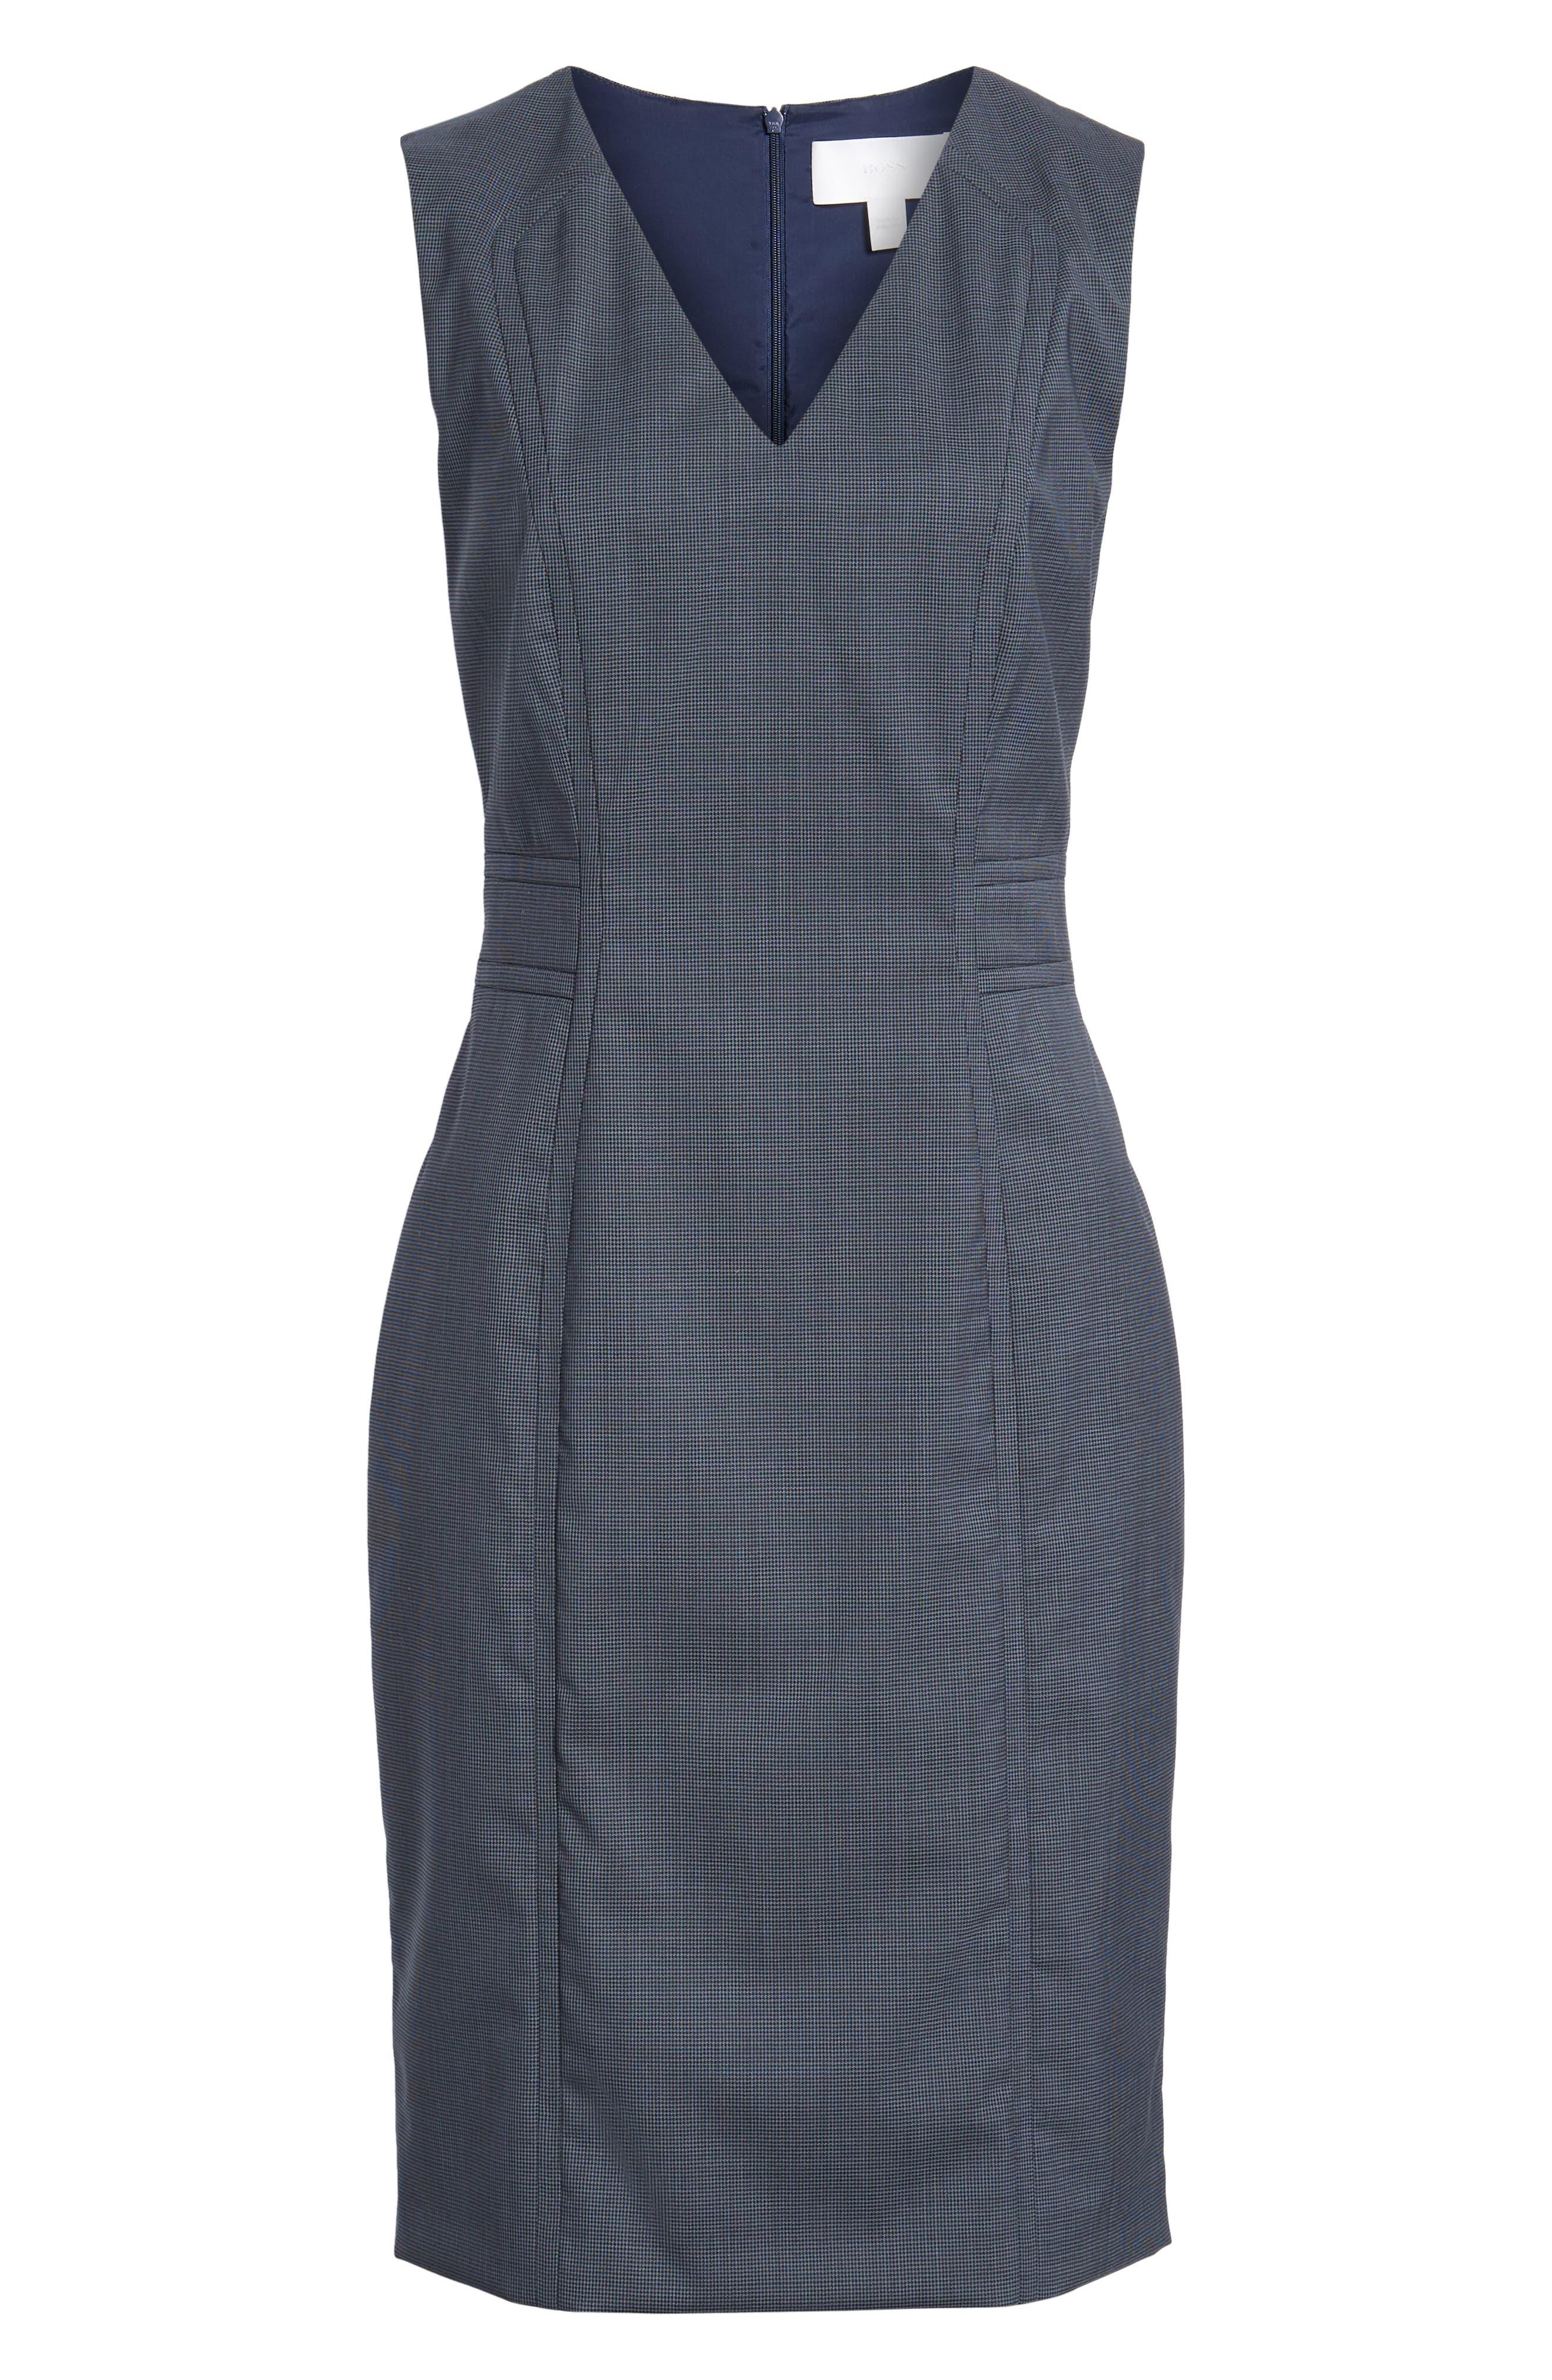 Dalouise Pepita Stretch Wool Sheath Dress,                             Alternate thumbnail 6, color,